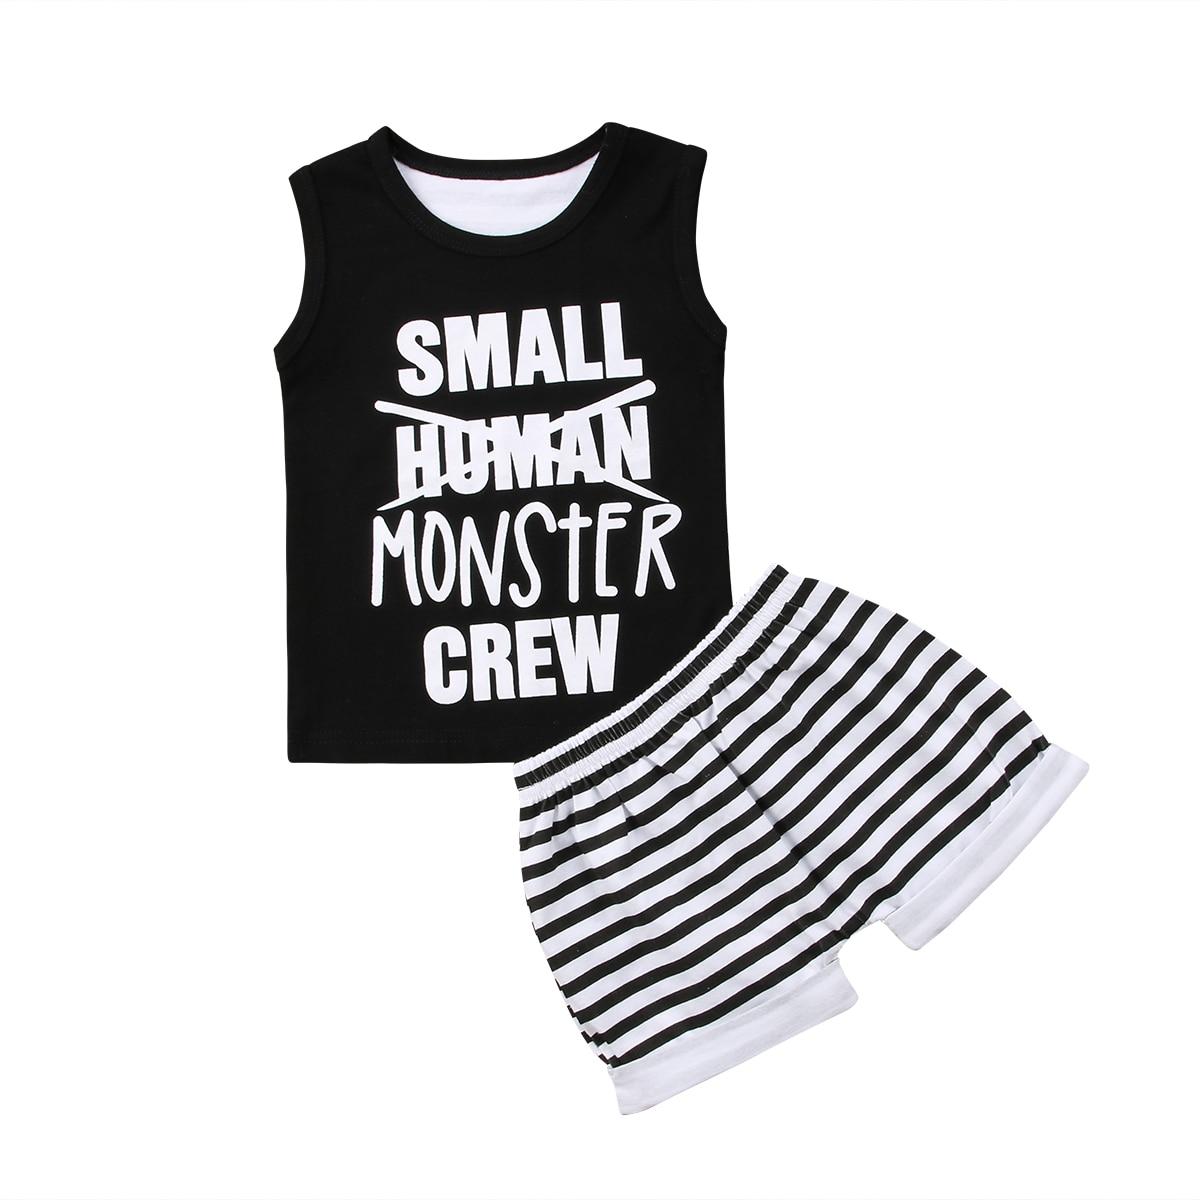 2PCS Set Newborn Toddler Baby Boy Casual Black Tops Tank